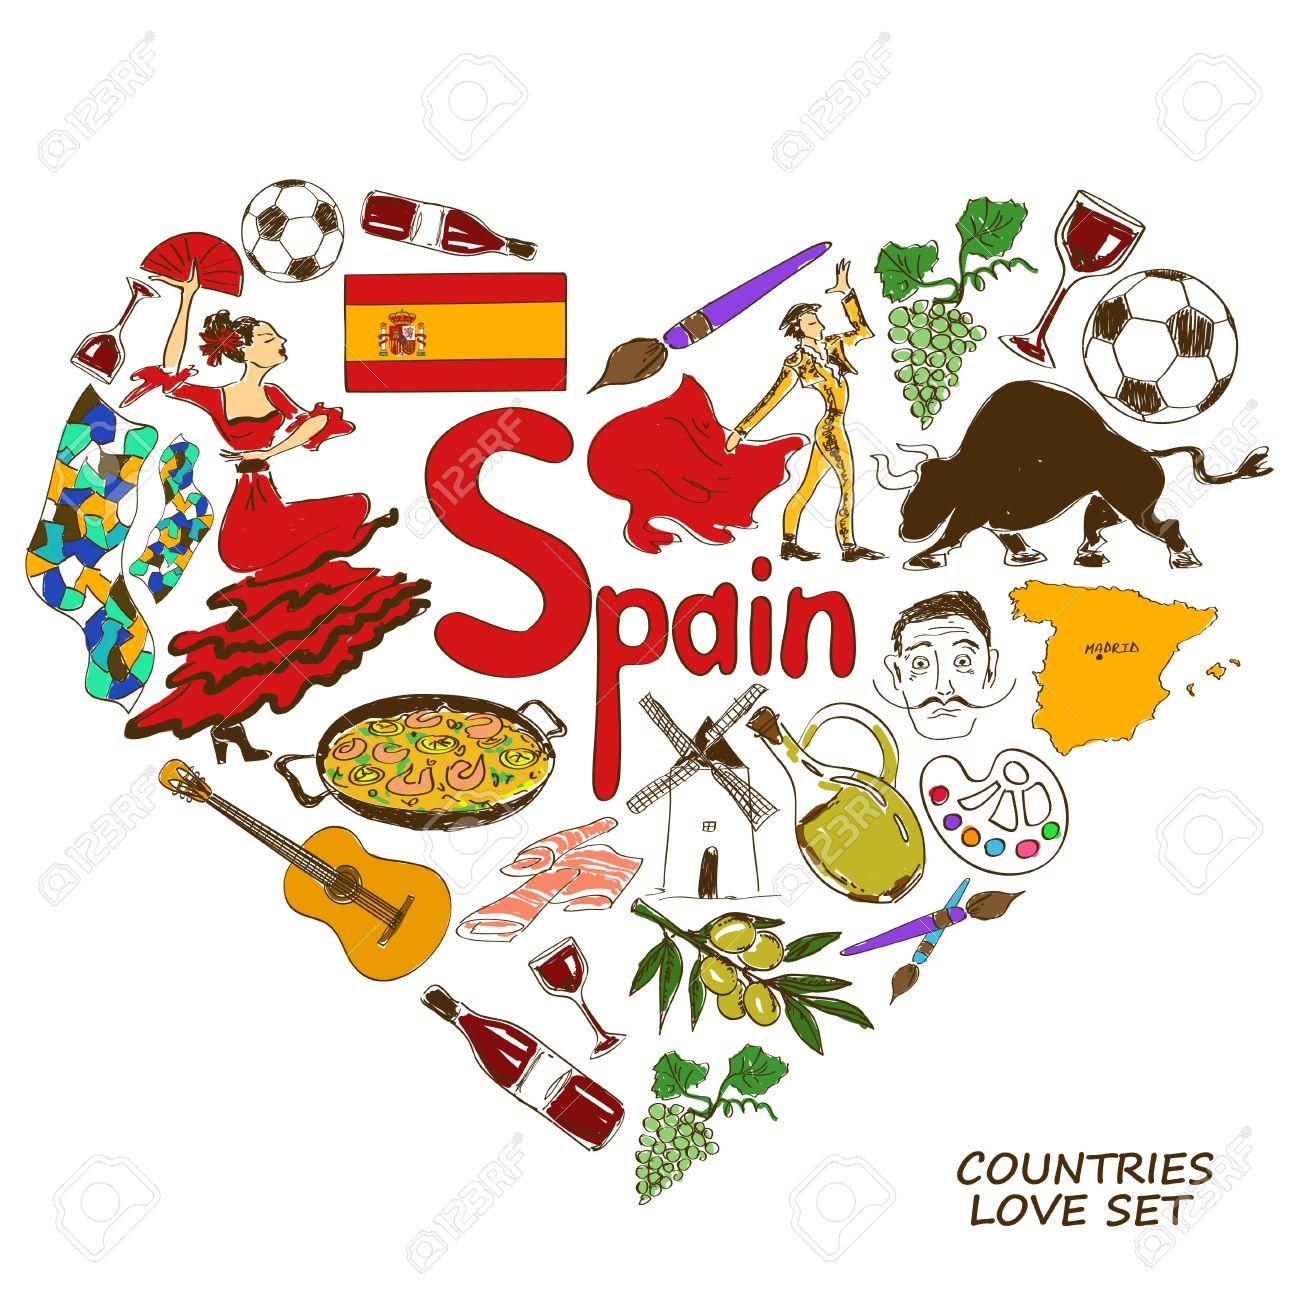 Spanish symbols in heart shape concept